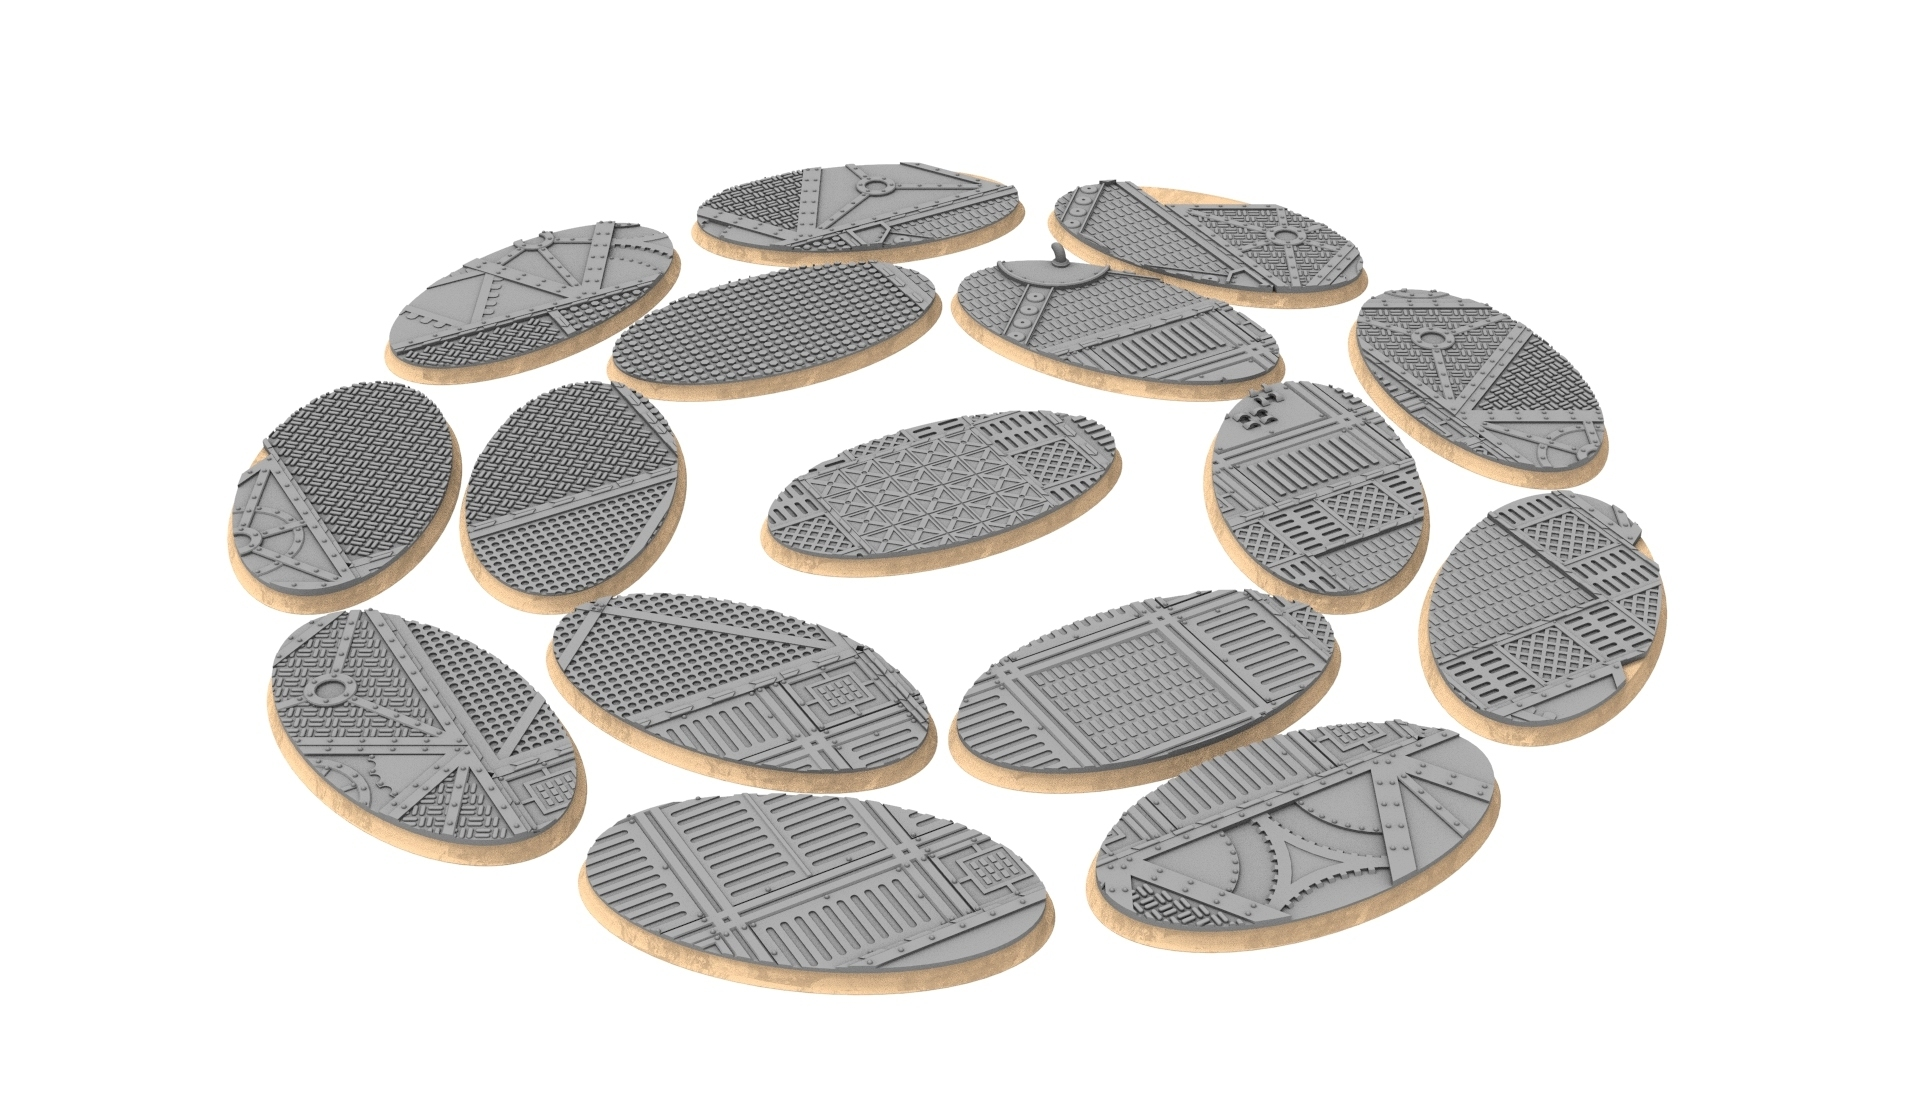 75x42.jpg Download STL file x1000 Round, oval, square, rectangular, hexagonal, industrial textured bases • 3D print design, Alario